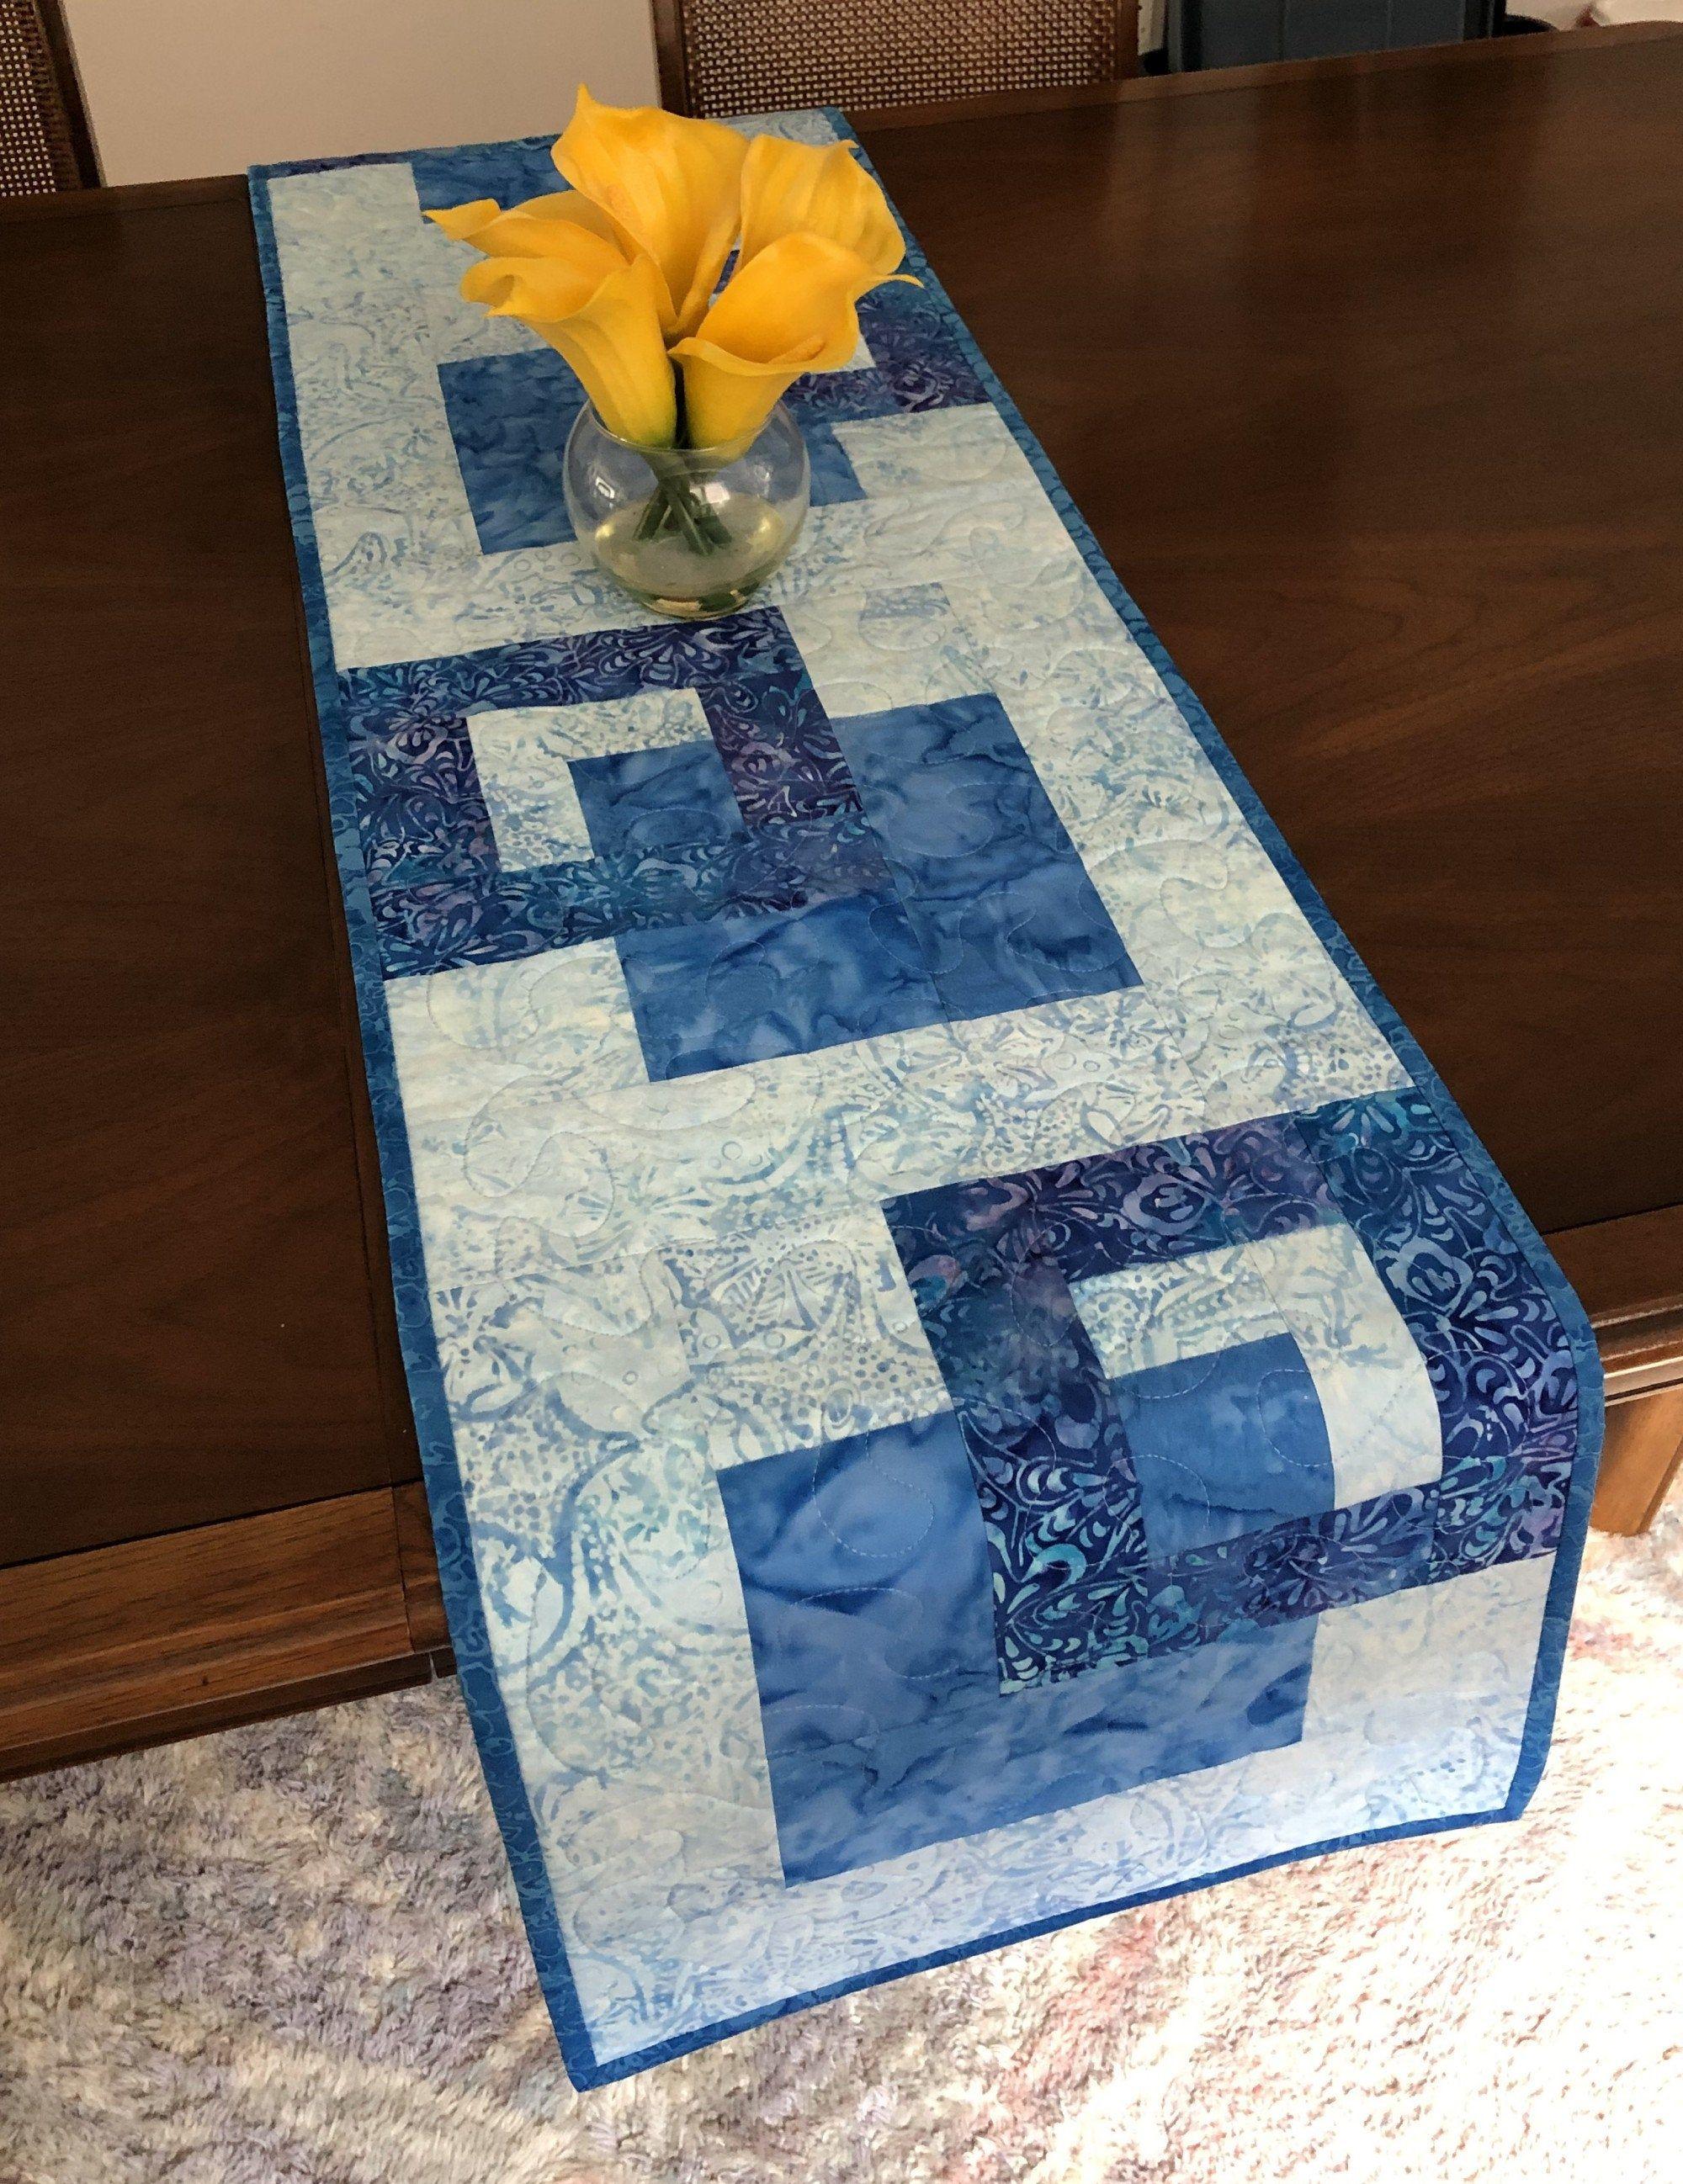 Bright Point Table Runner Dining Table Runner Quilted Table Runner Table Decor Handmade Runner